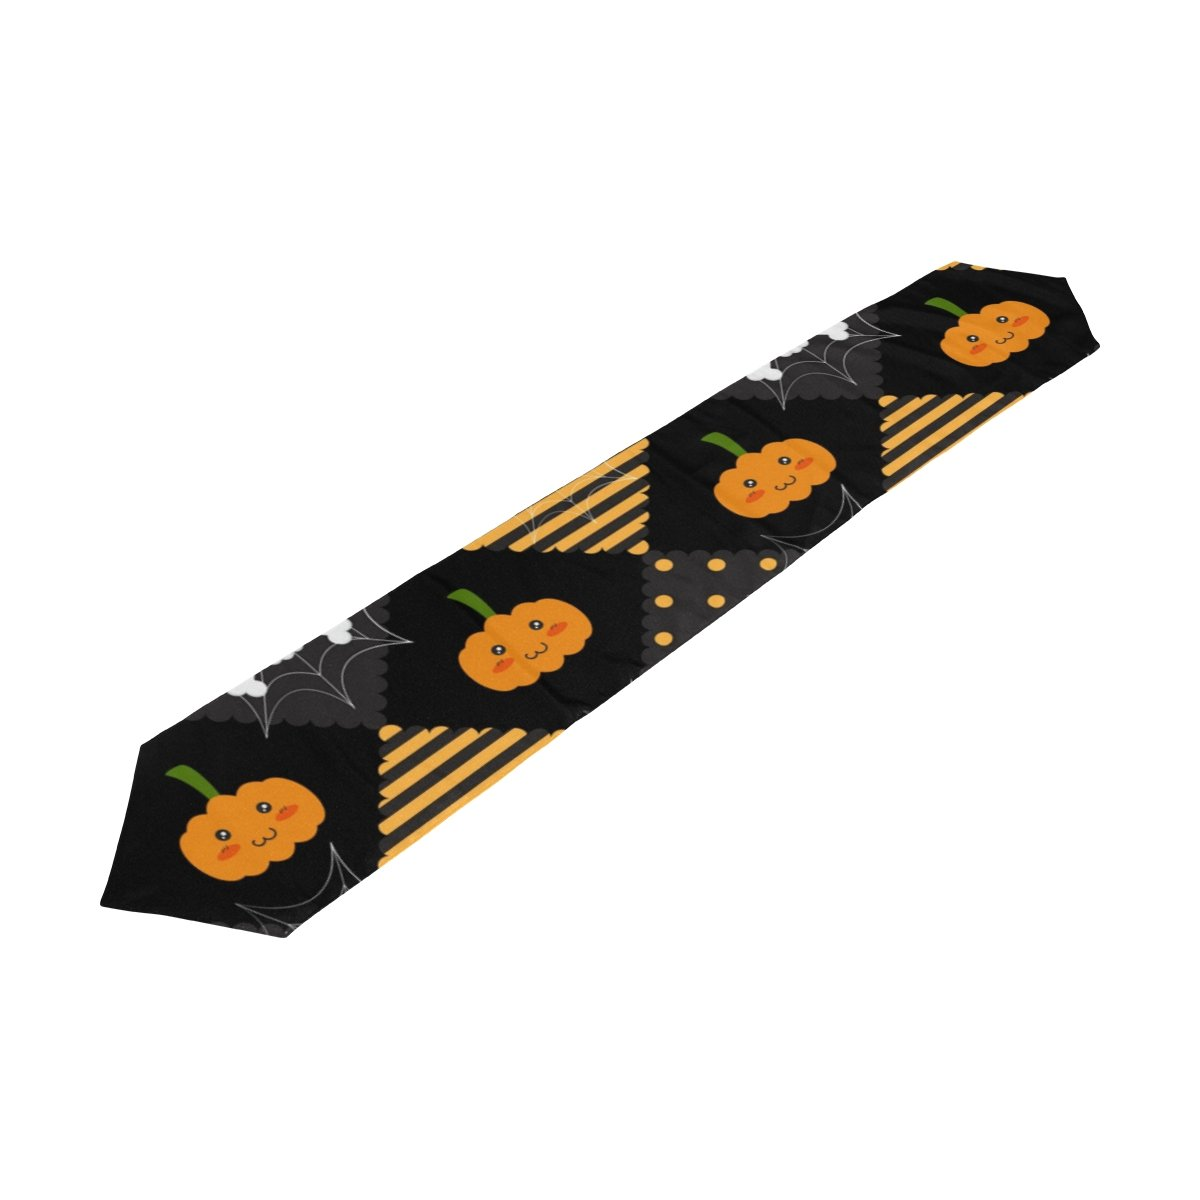 U LIFEヴィンテージストライプハッピーハロウィンスカルパンプキンかぼちゃSkullsテーブルランナーランナー13 x 70 & 13 x 90インチ 13x90 inch 13x90 inch  B075SSHL5M